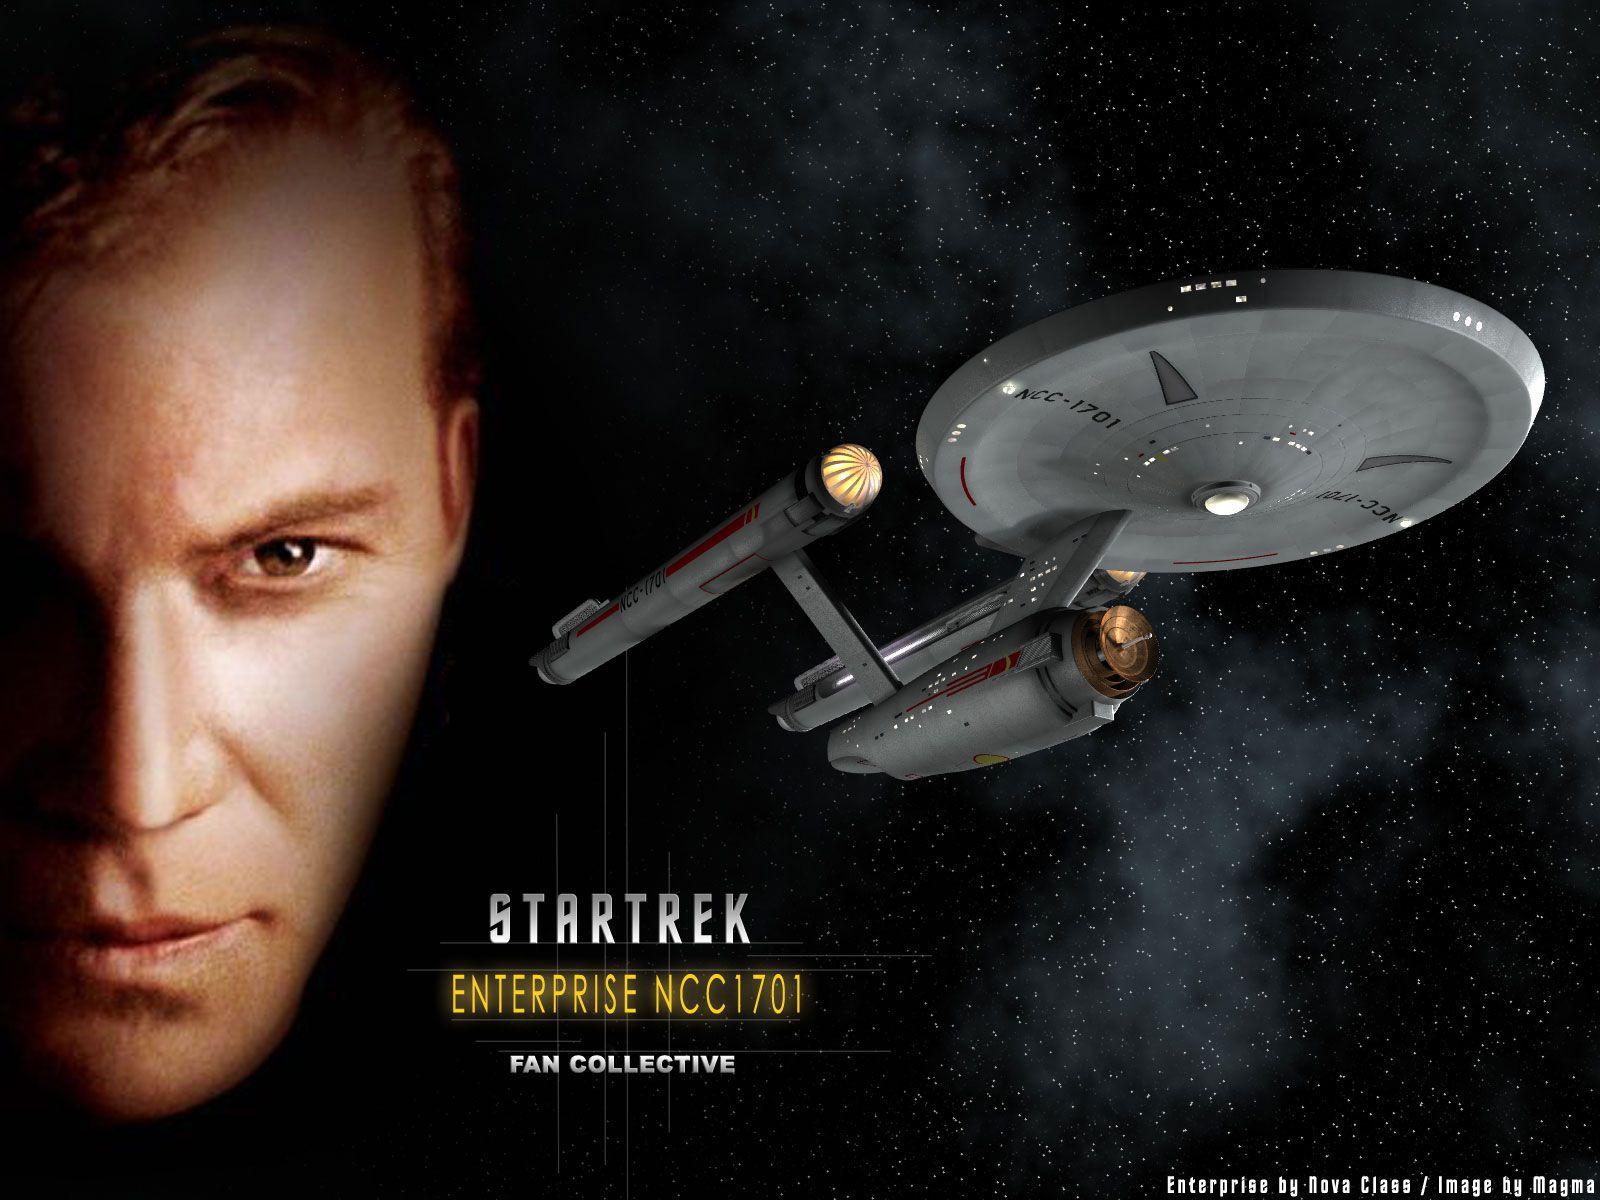 Star Trek Wallpaper Trek Enterprise Ncc1701 Free Star Trek Computer Desktop Wallpaper Star Trek Original Star Trek Enterprise Star Trek Starships